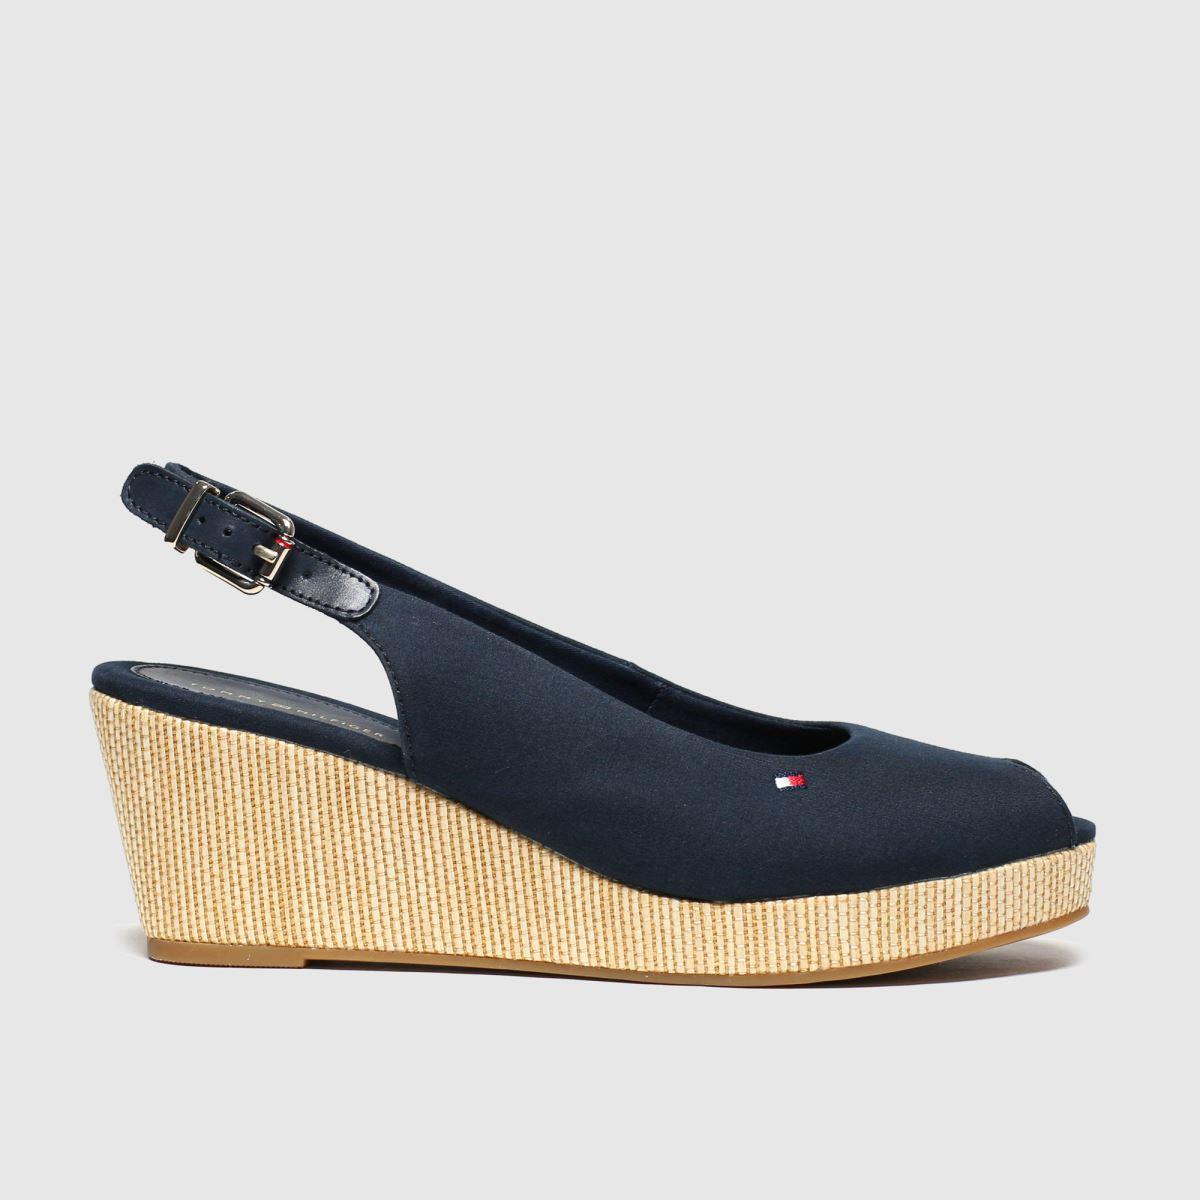 Tommy Hilfiger Navy Iconic Elba Slingback Wedge Low Heels